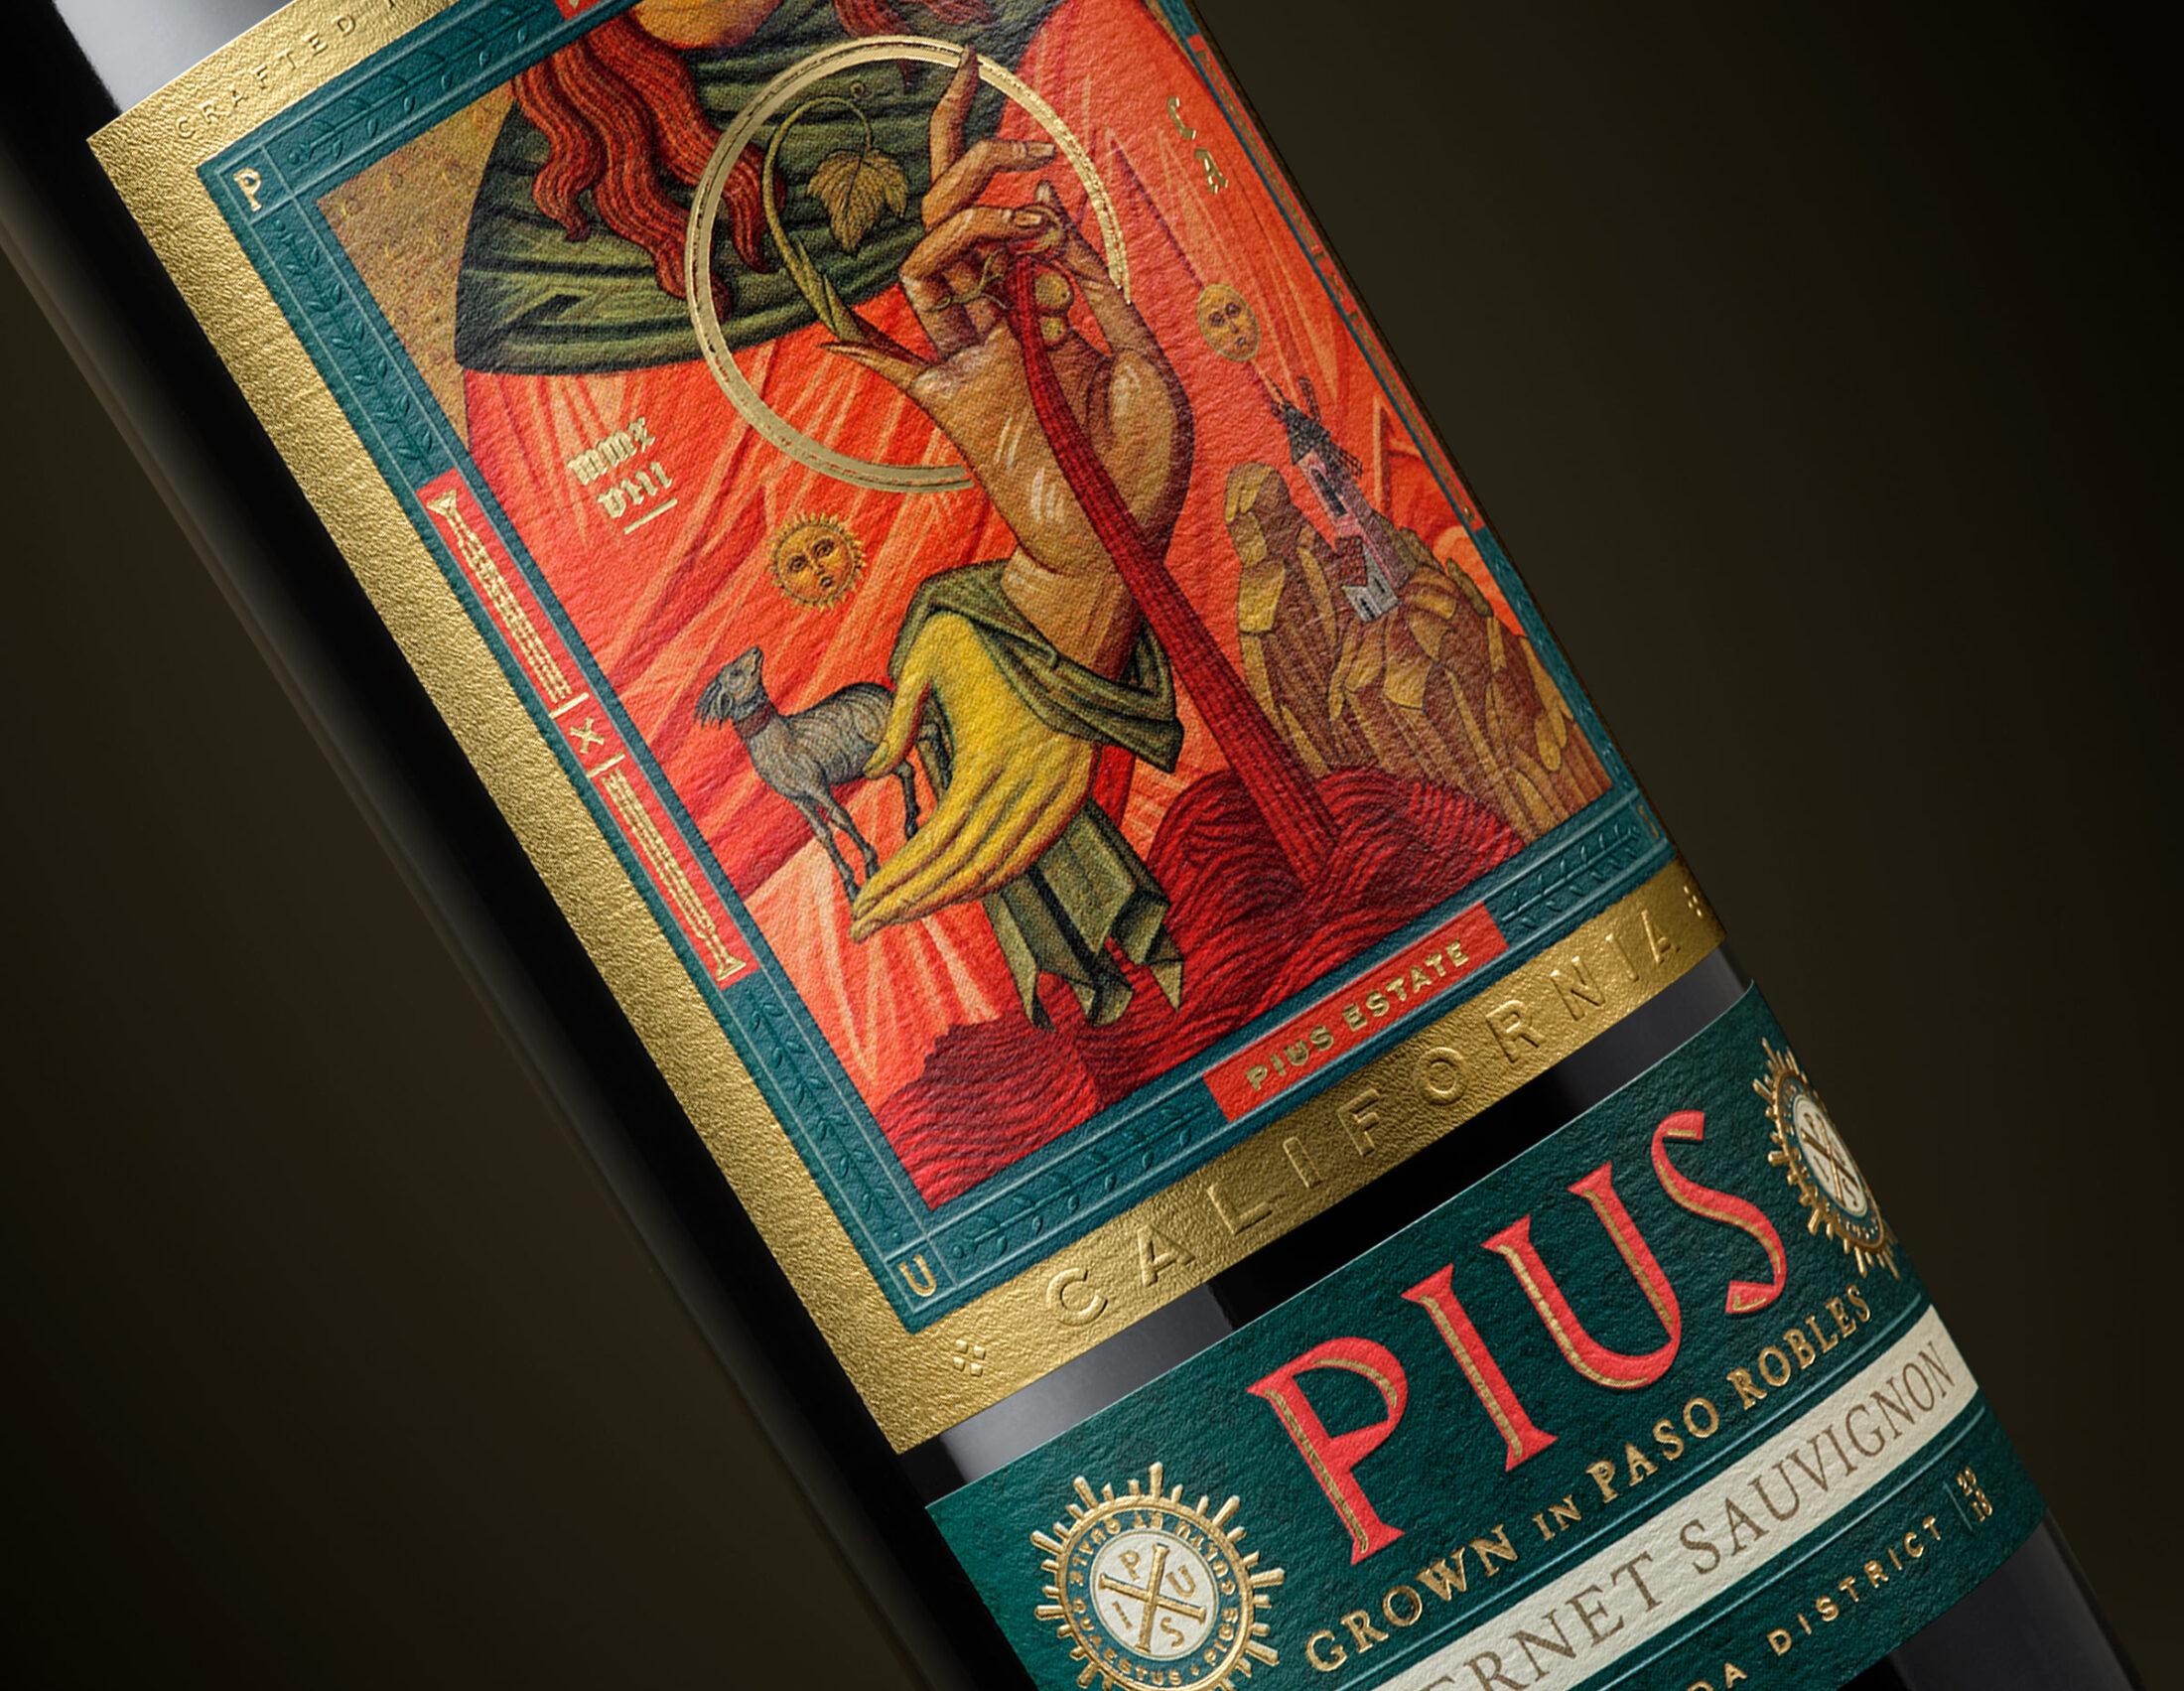 PIUS by Chad Michael Studio